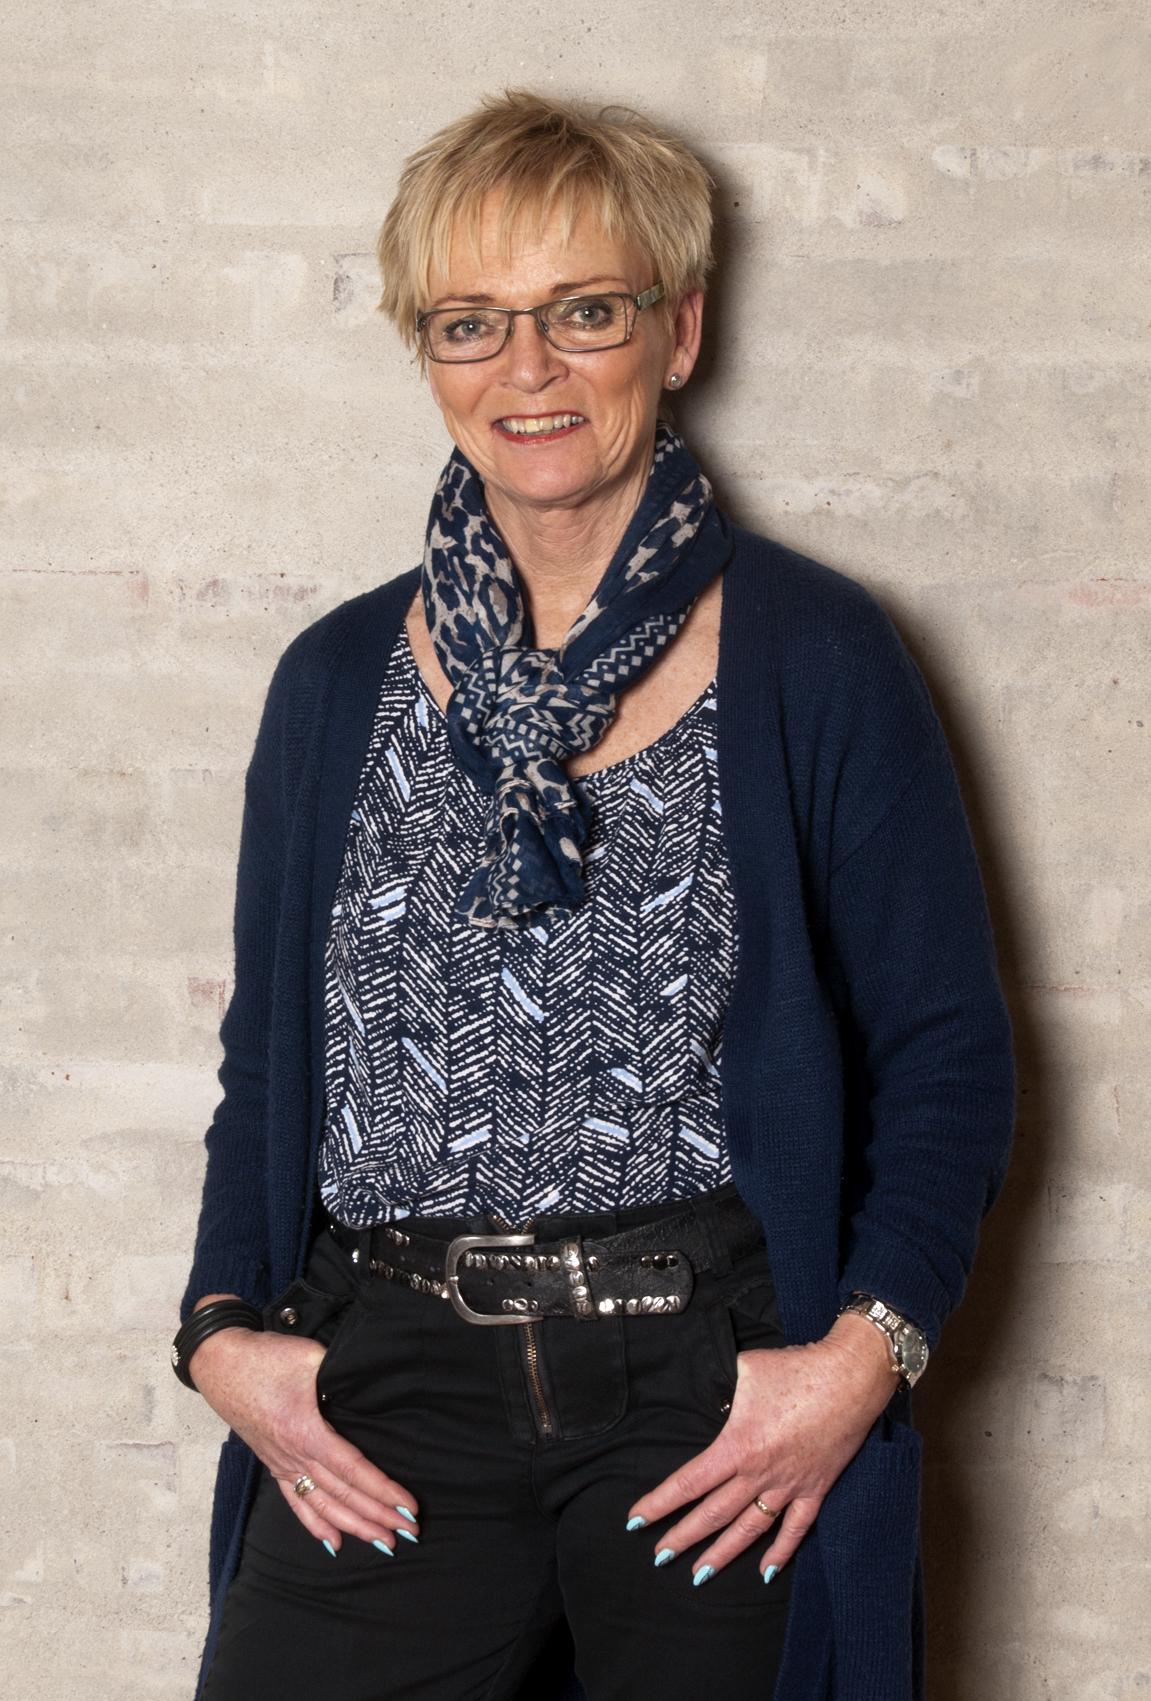 Lena Lybkjær